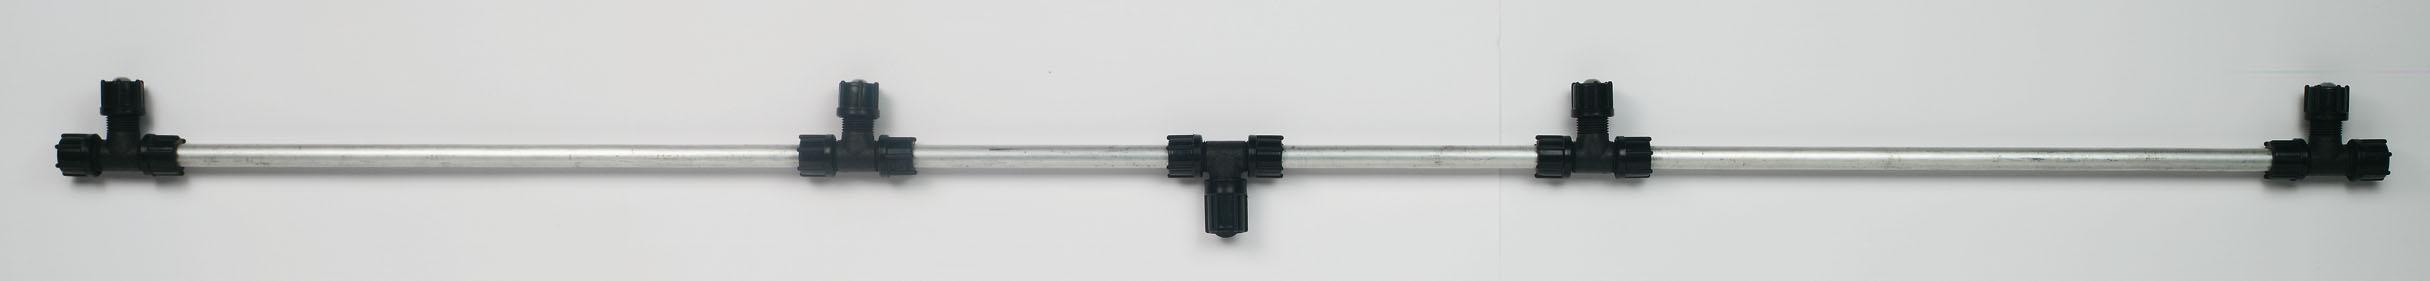 4 dyse sprøyte Solo, 120 cm